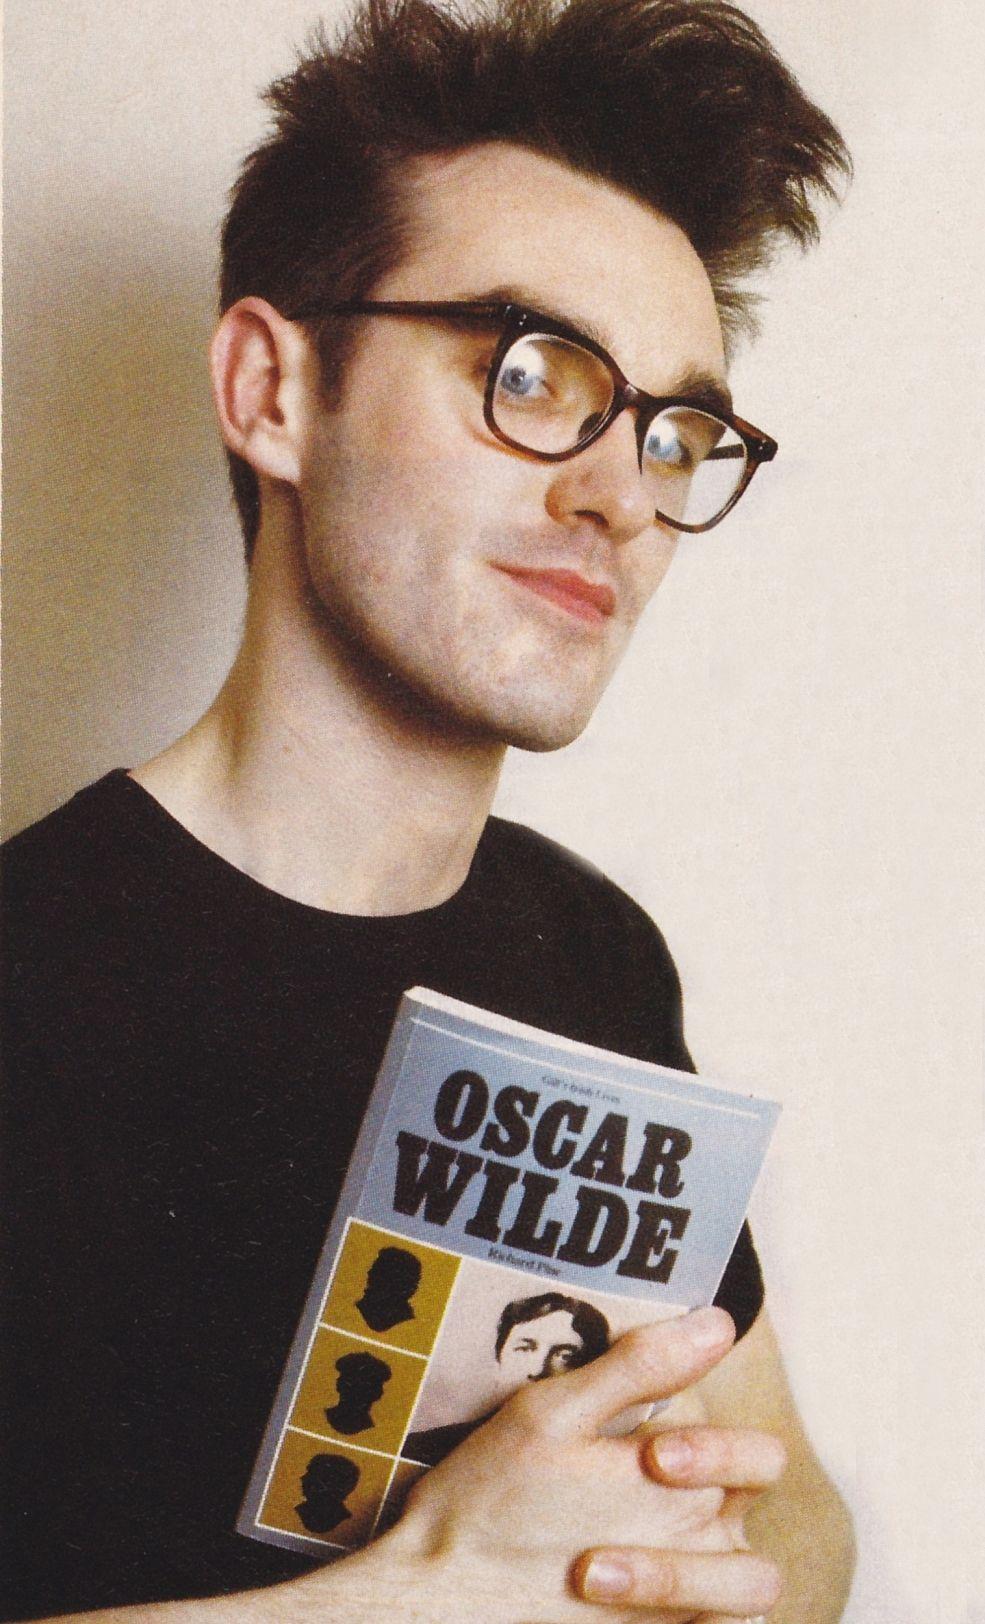 Morrissey With Oscar Wilde Book